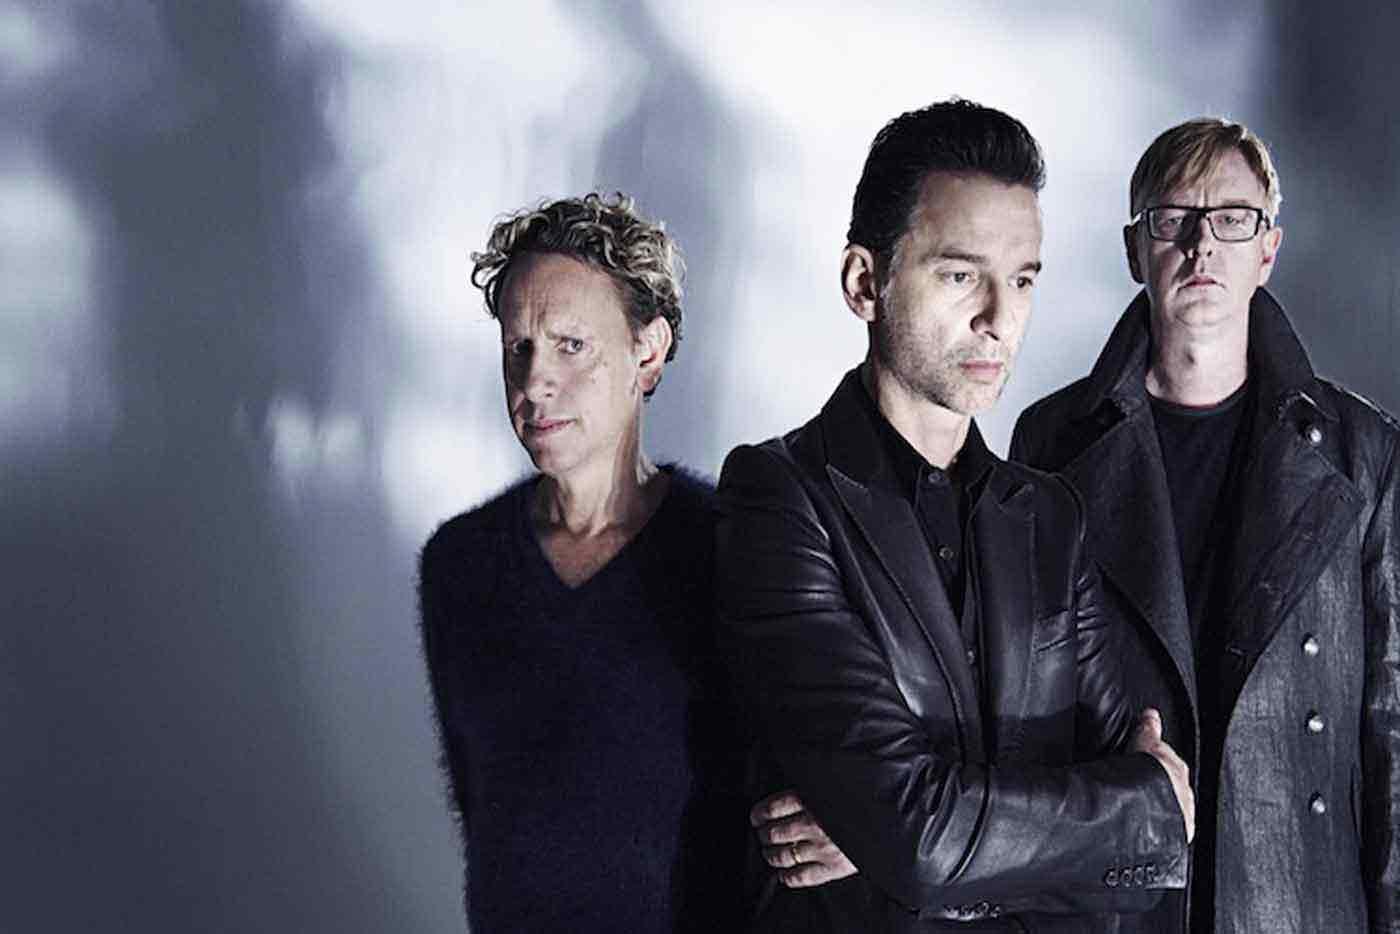 Escucha el nuevo single de Depeche Mode